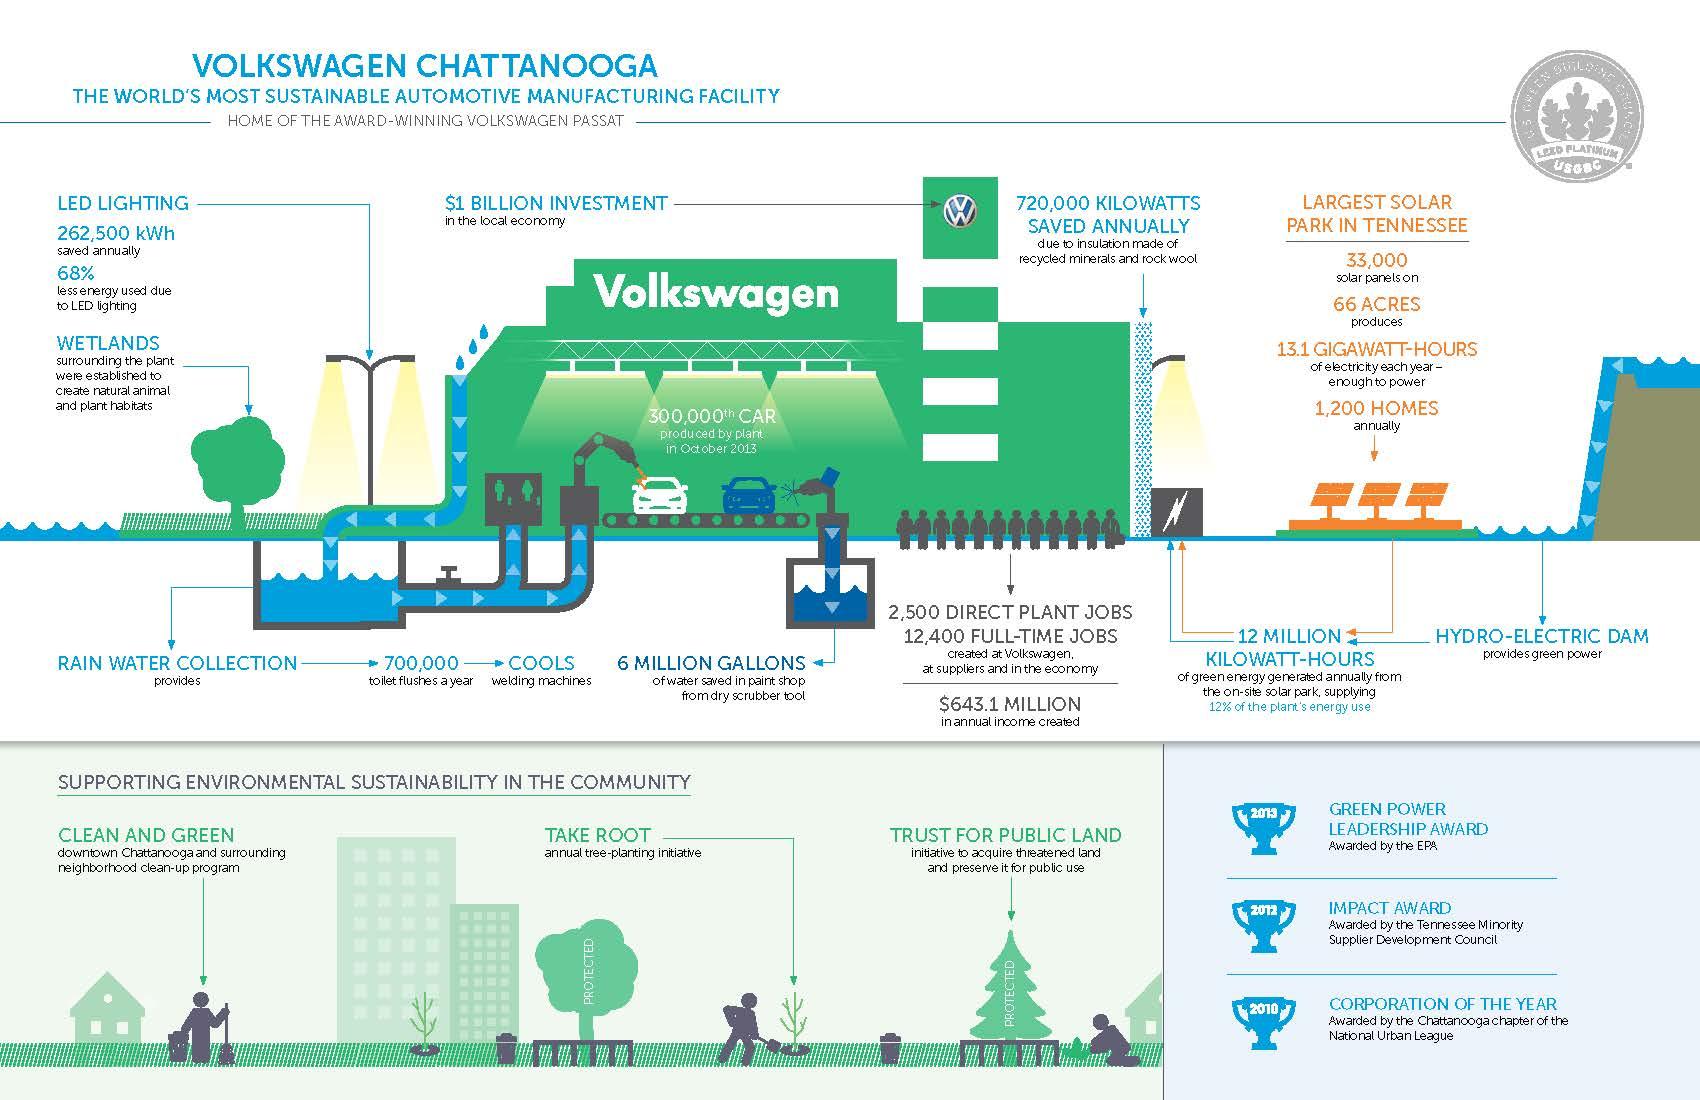 Volkswagen Group Of America Releases 2013 Corporate Social